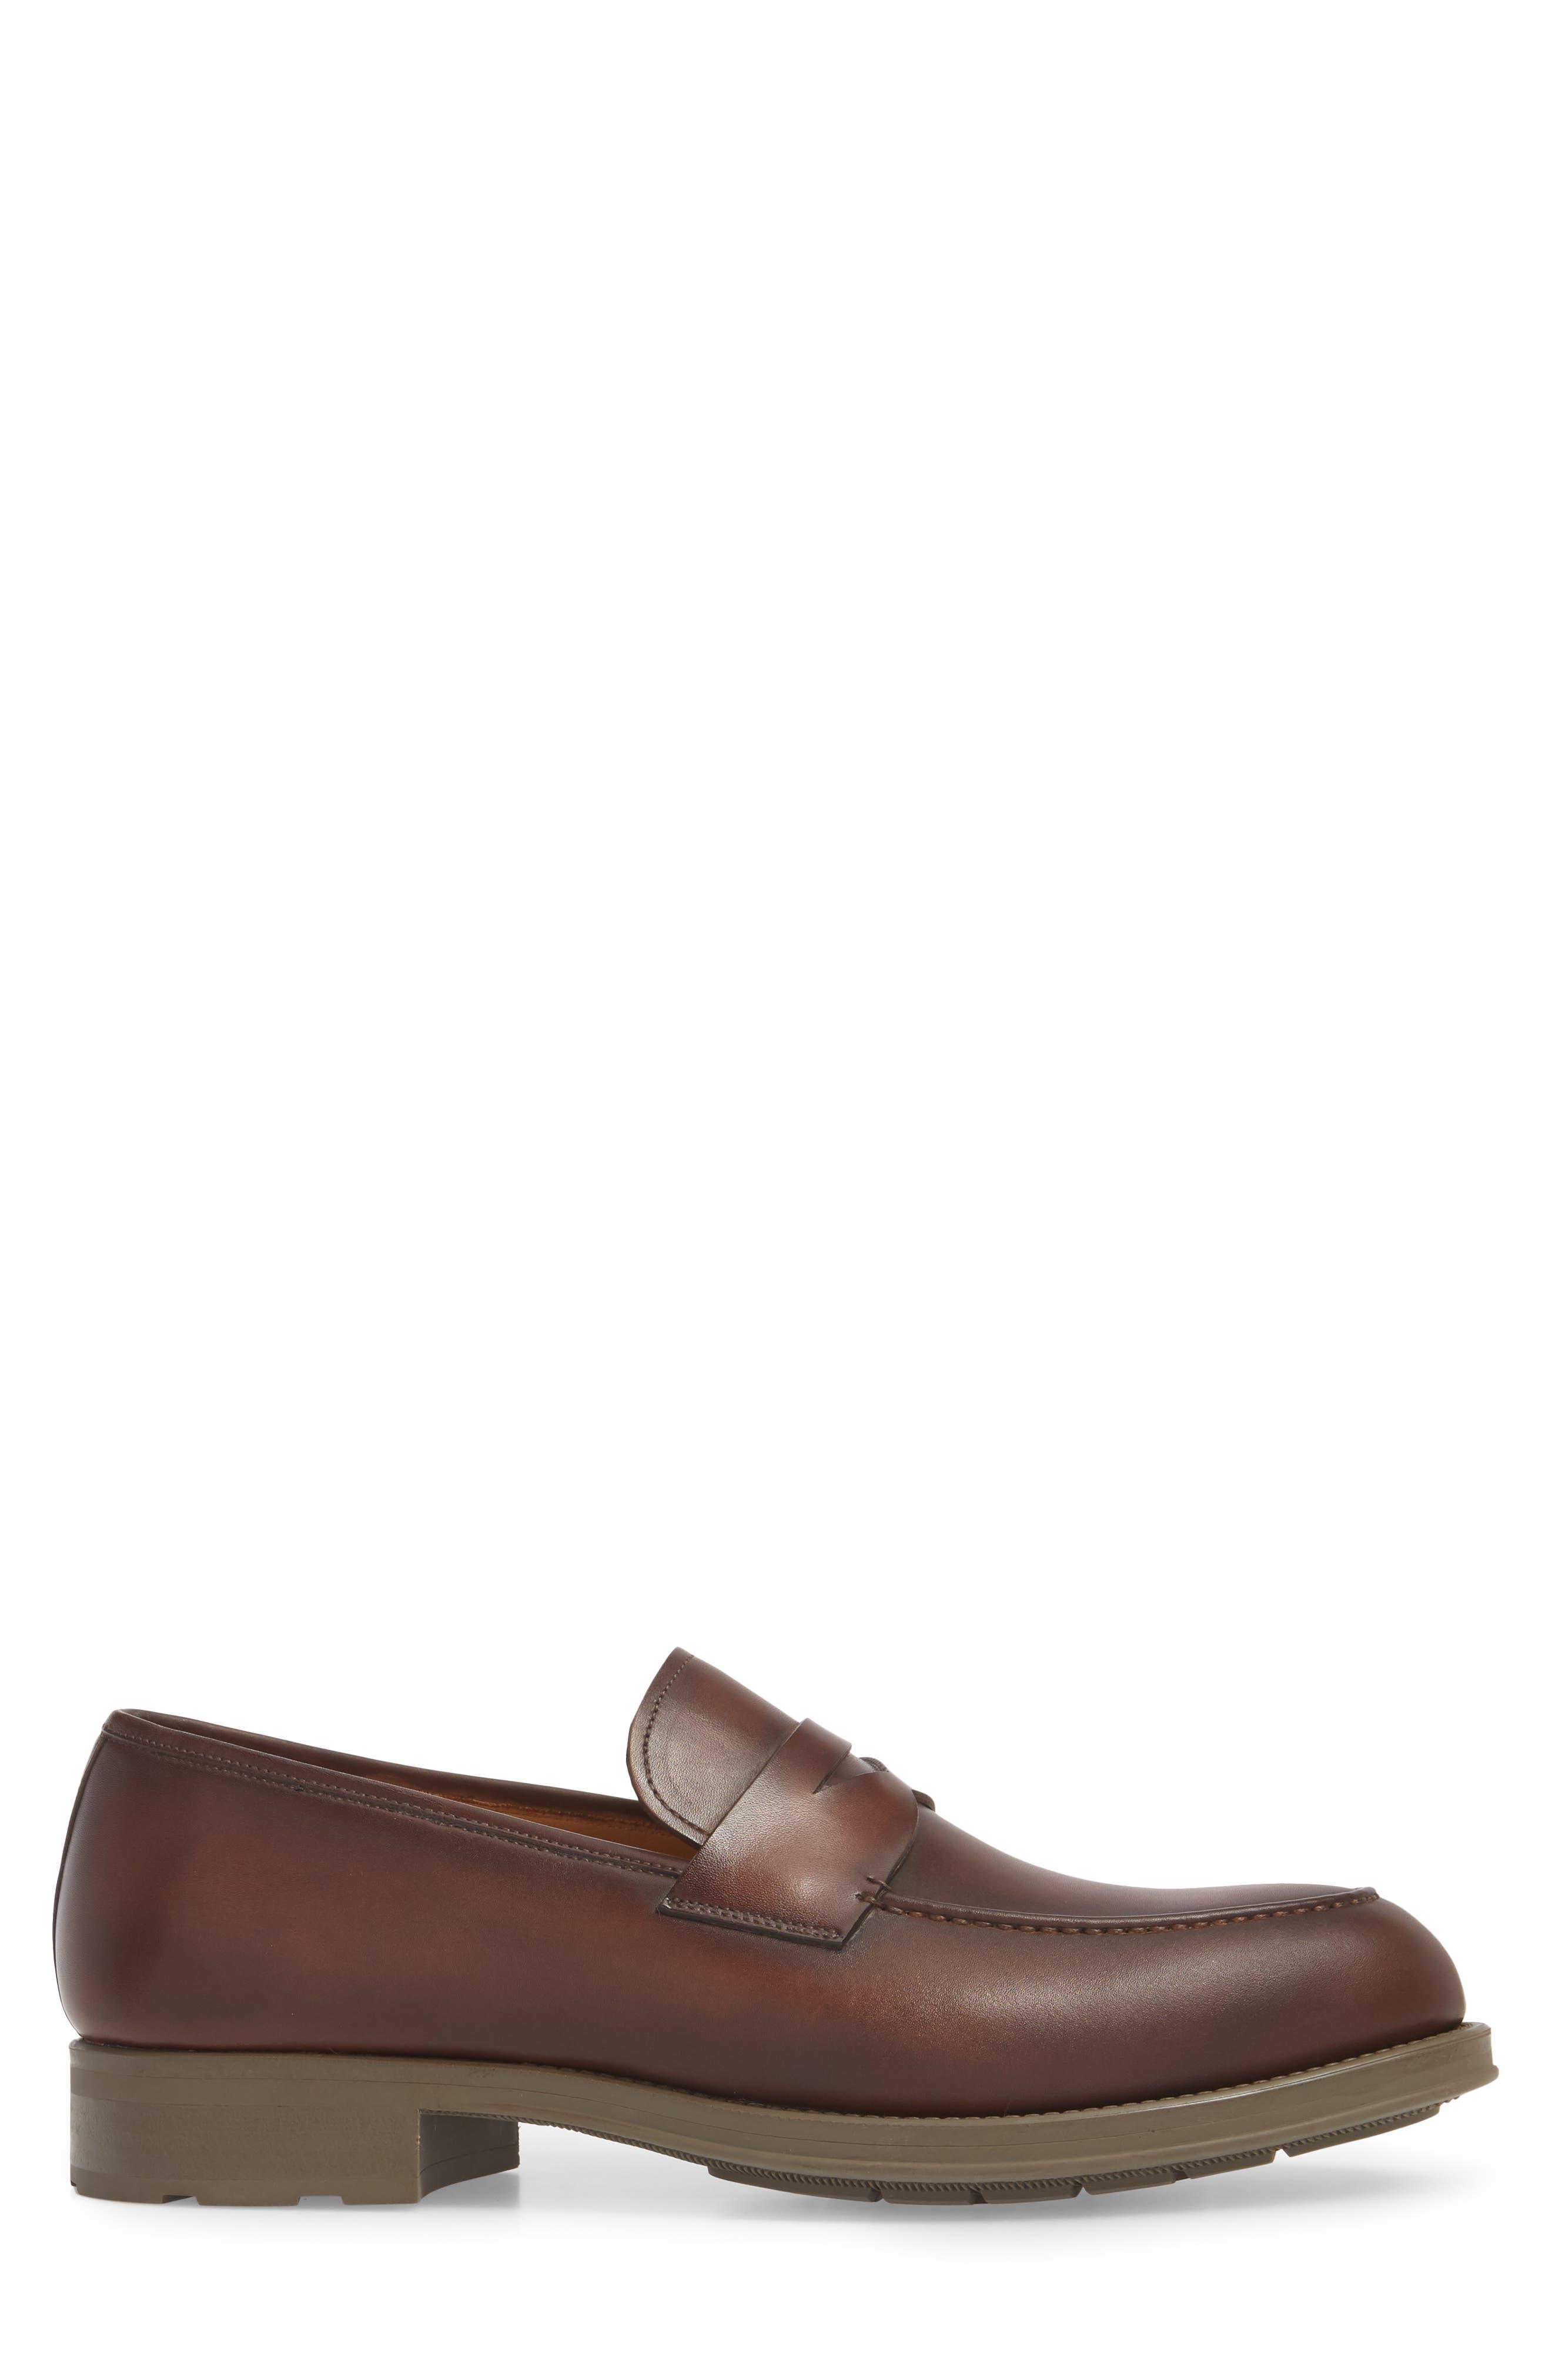 Bernardo Penny Loafer,                             Alternate thumbnail 3, color,                             Brown Leather